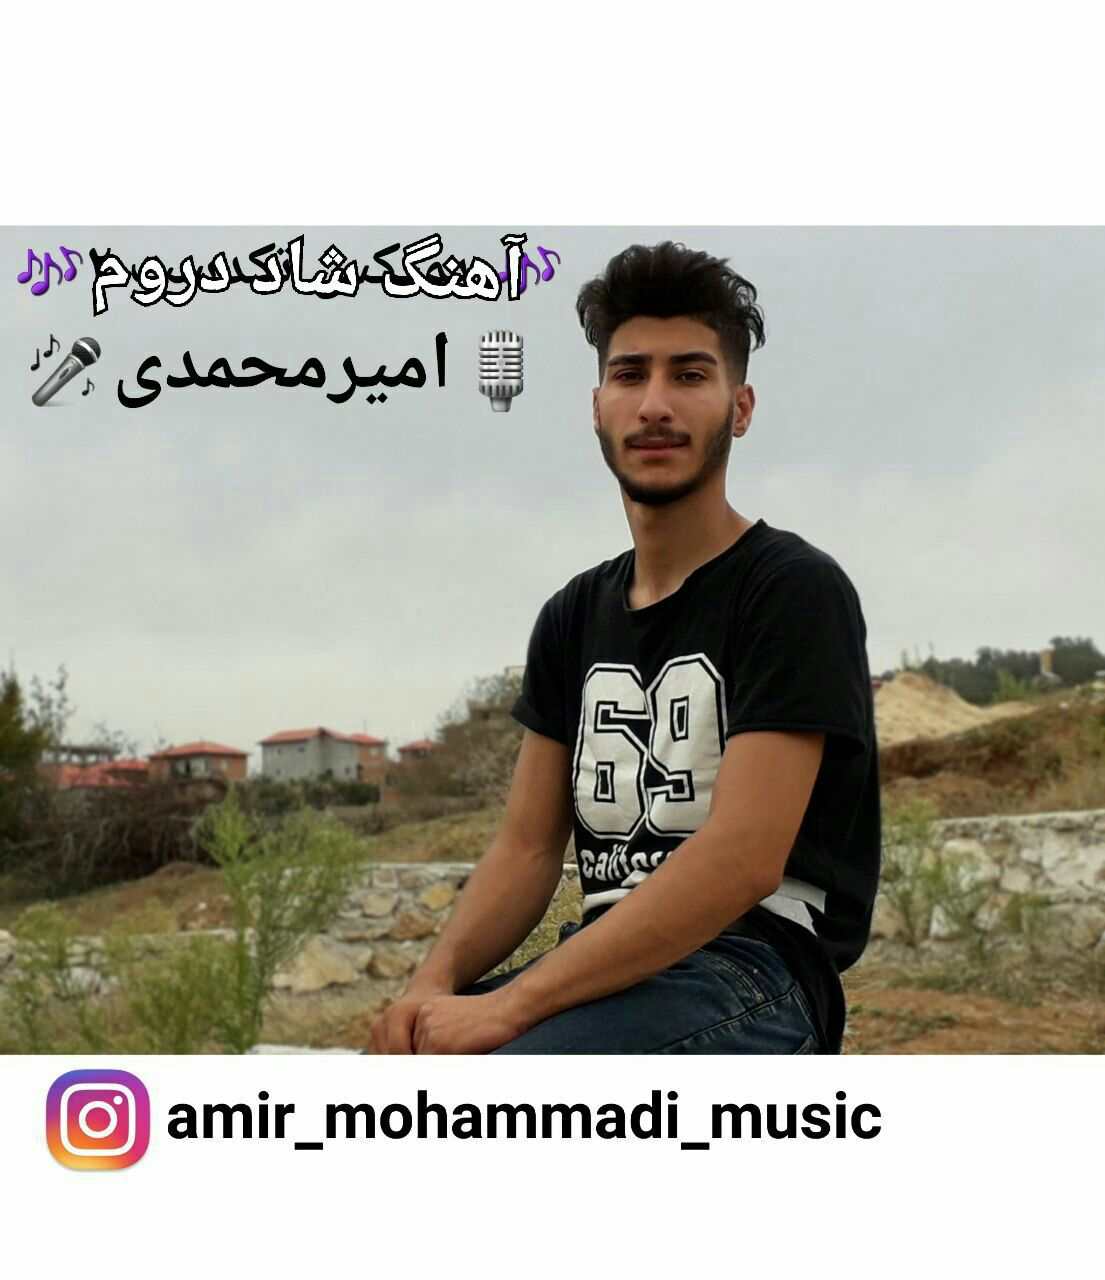 امیر محمدی لاکسری شاد دروم upahang.com